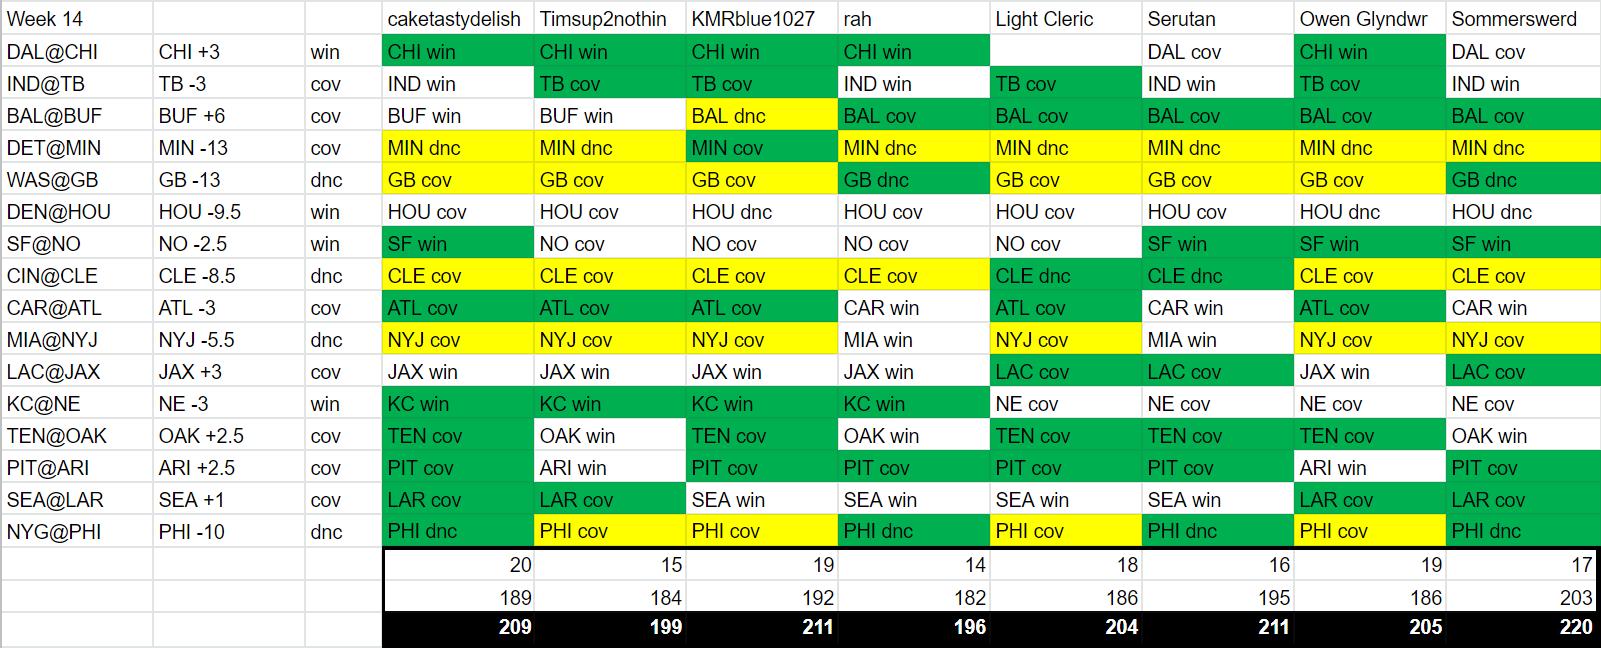 Week 14 Results.png